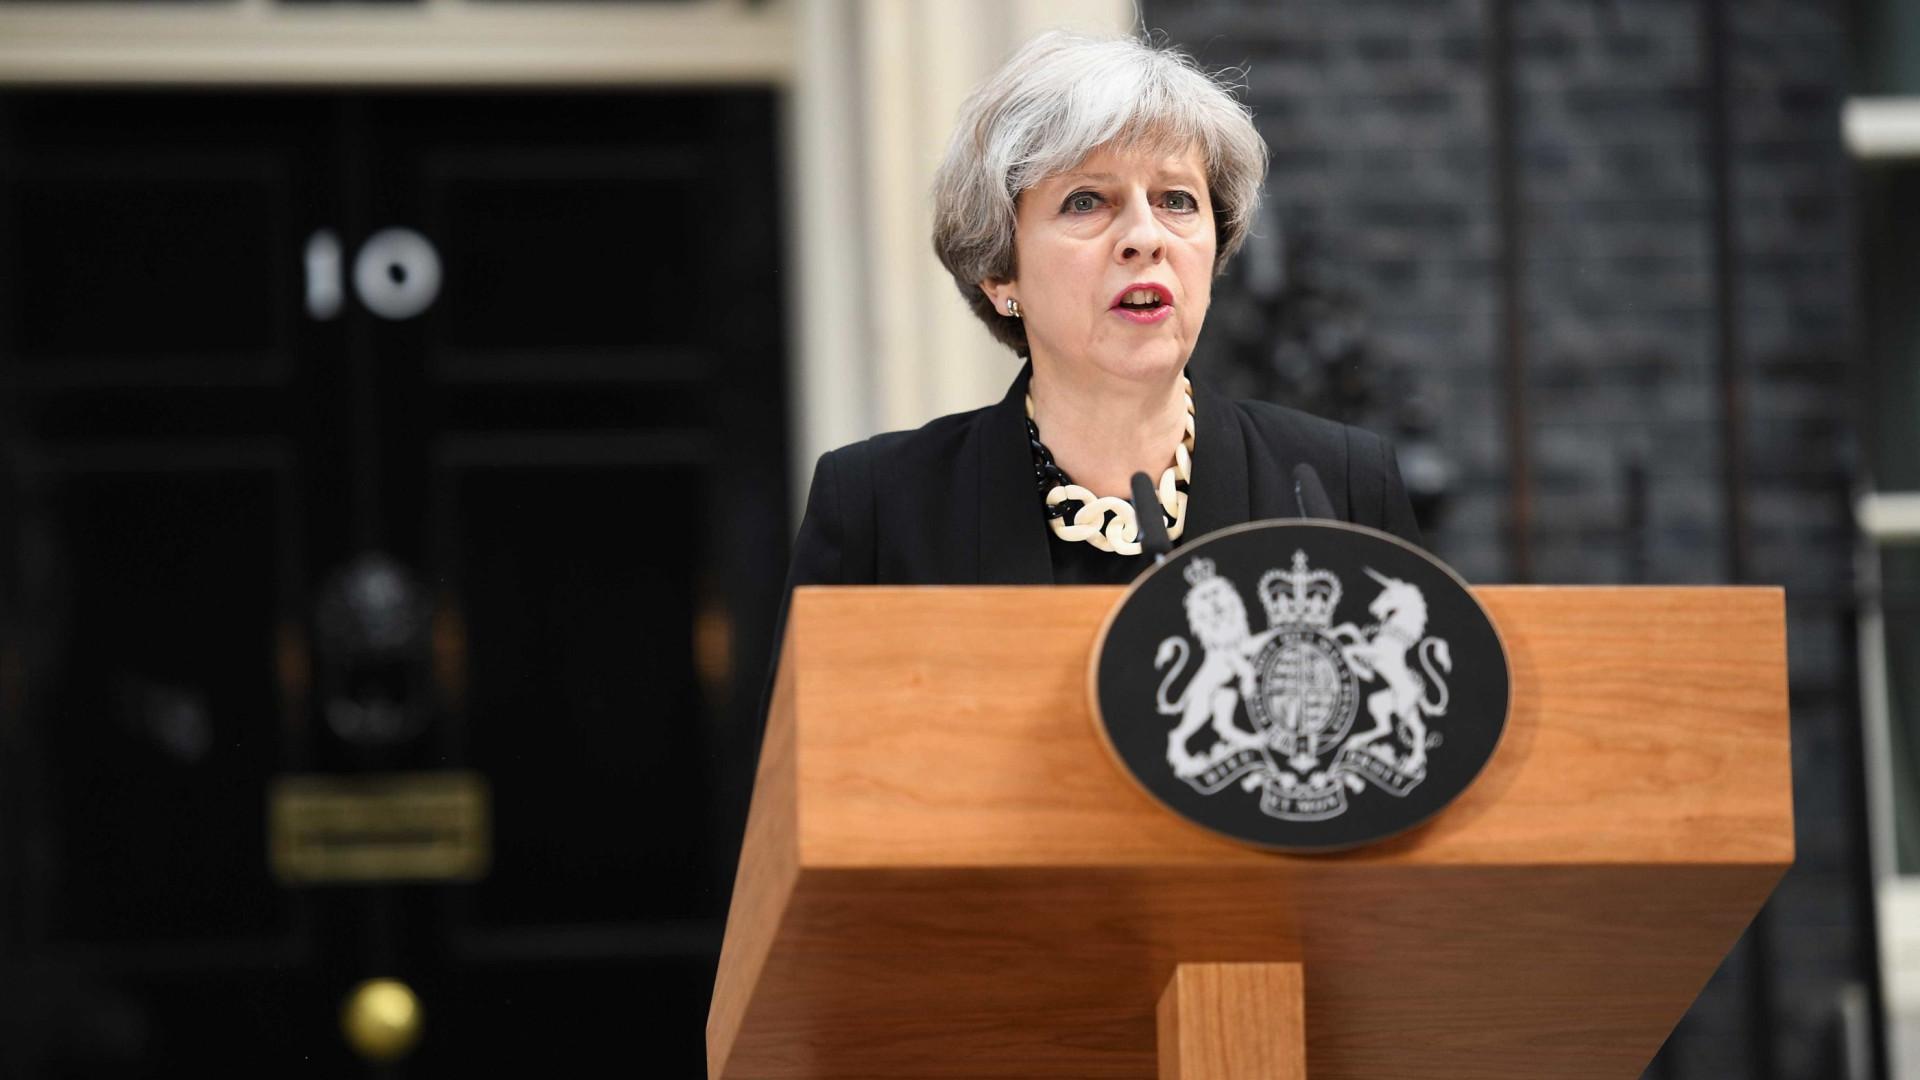 Theresa May aproveita visita de Trump para preparar o pós-Brexit